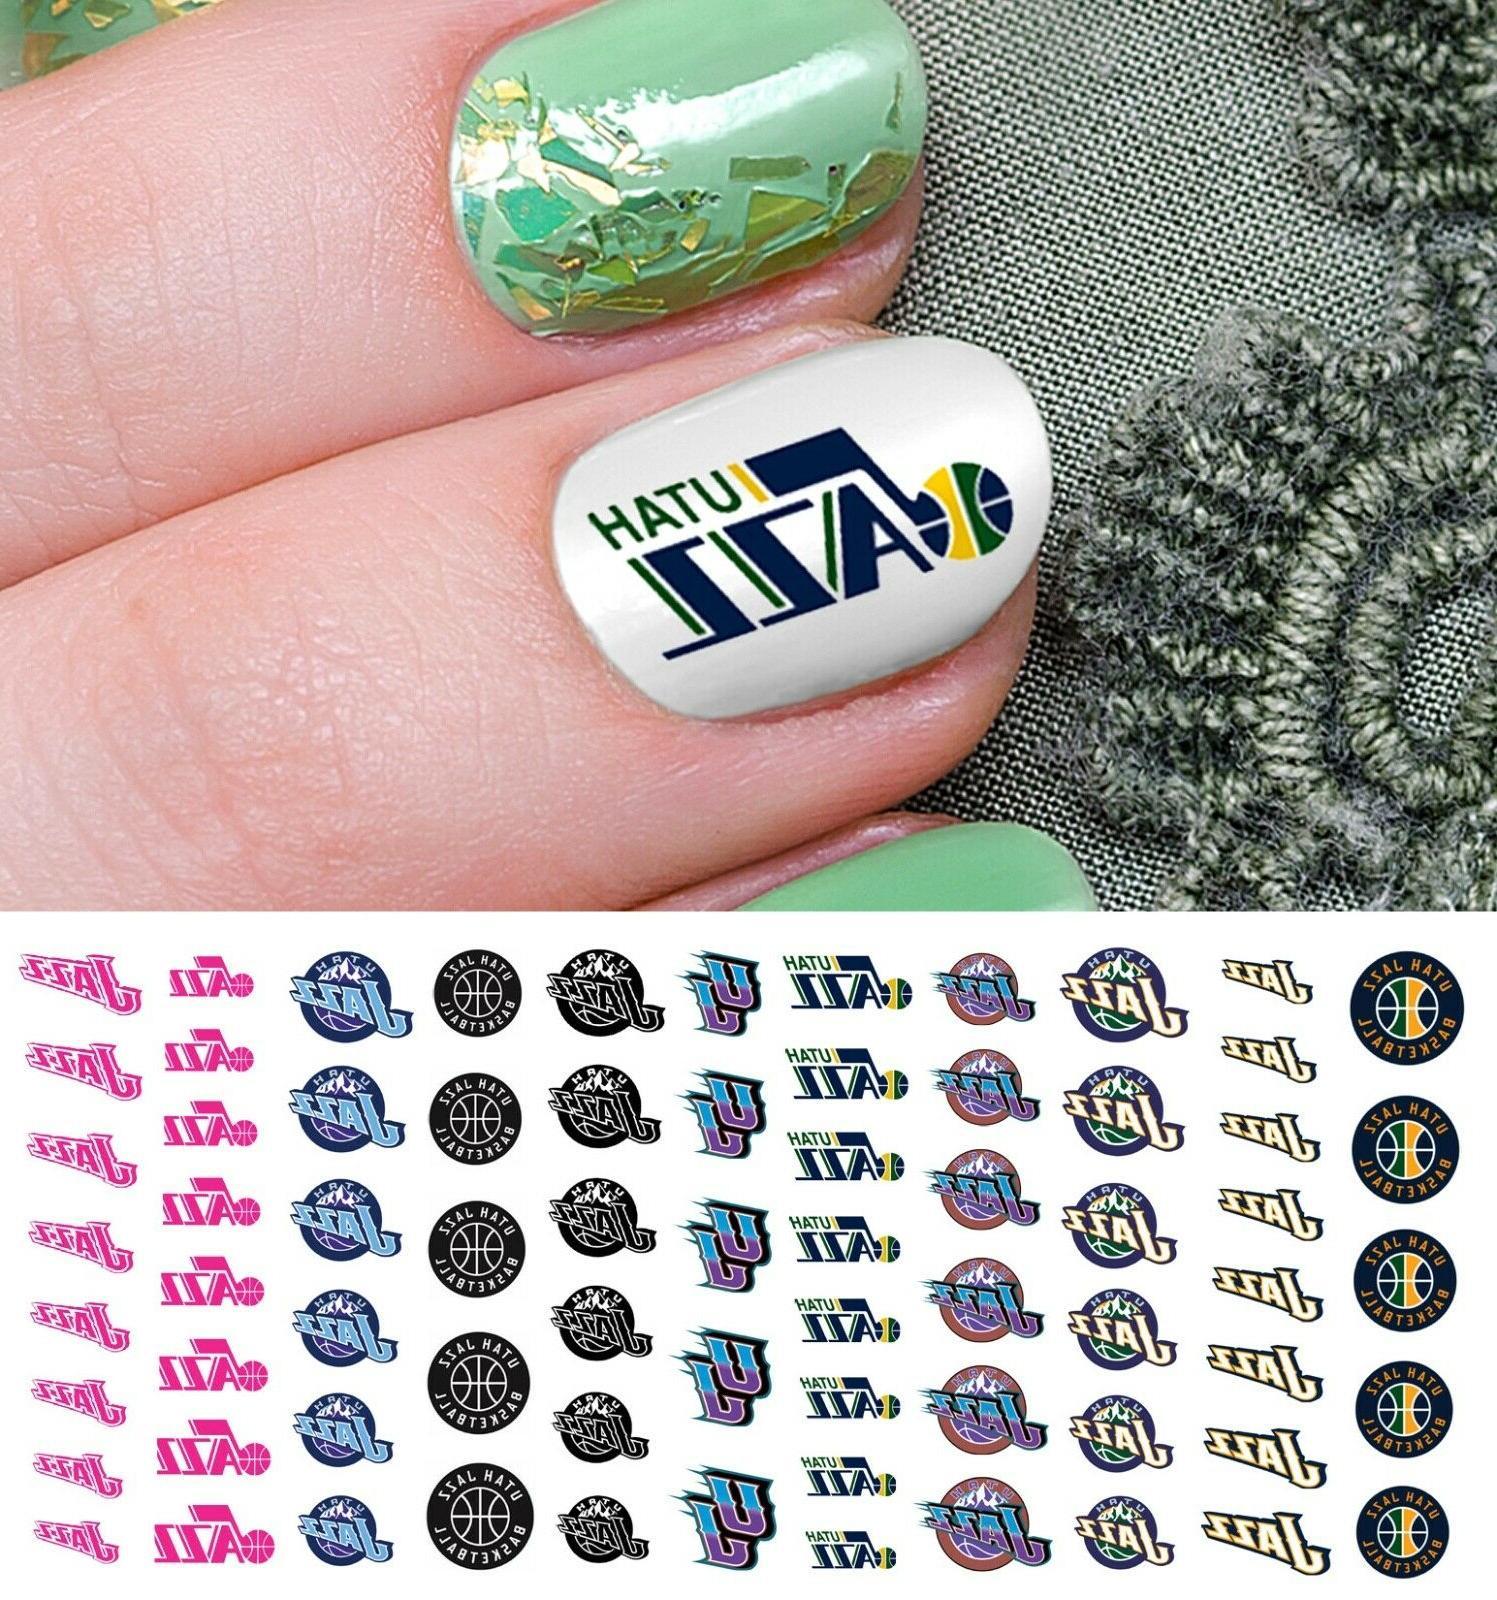 utah jazz basketball nail art decals salon